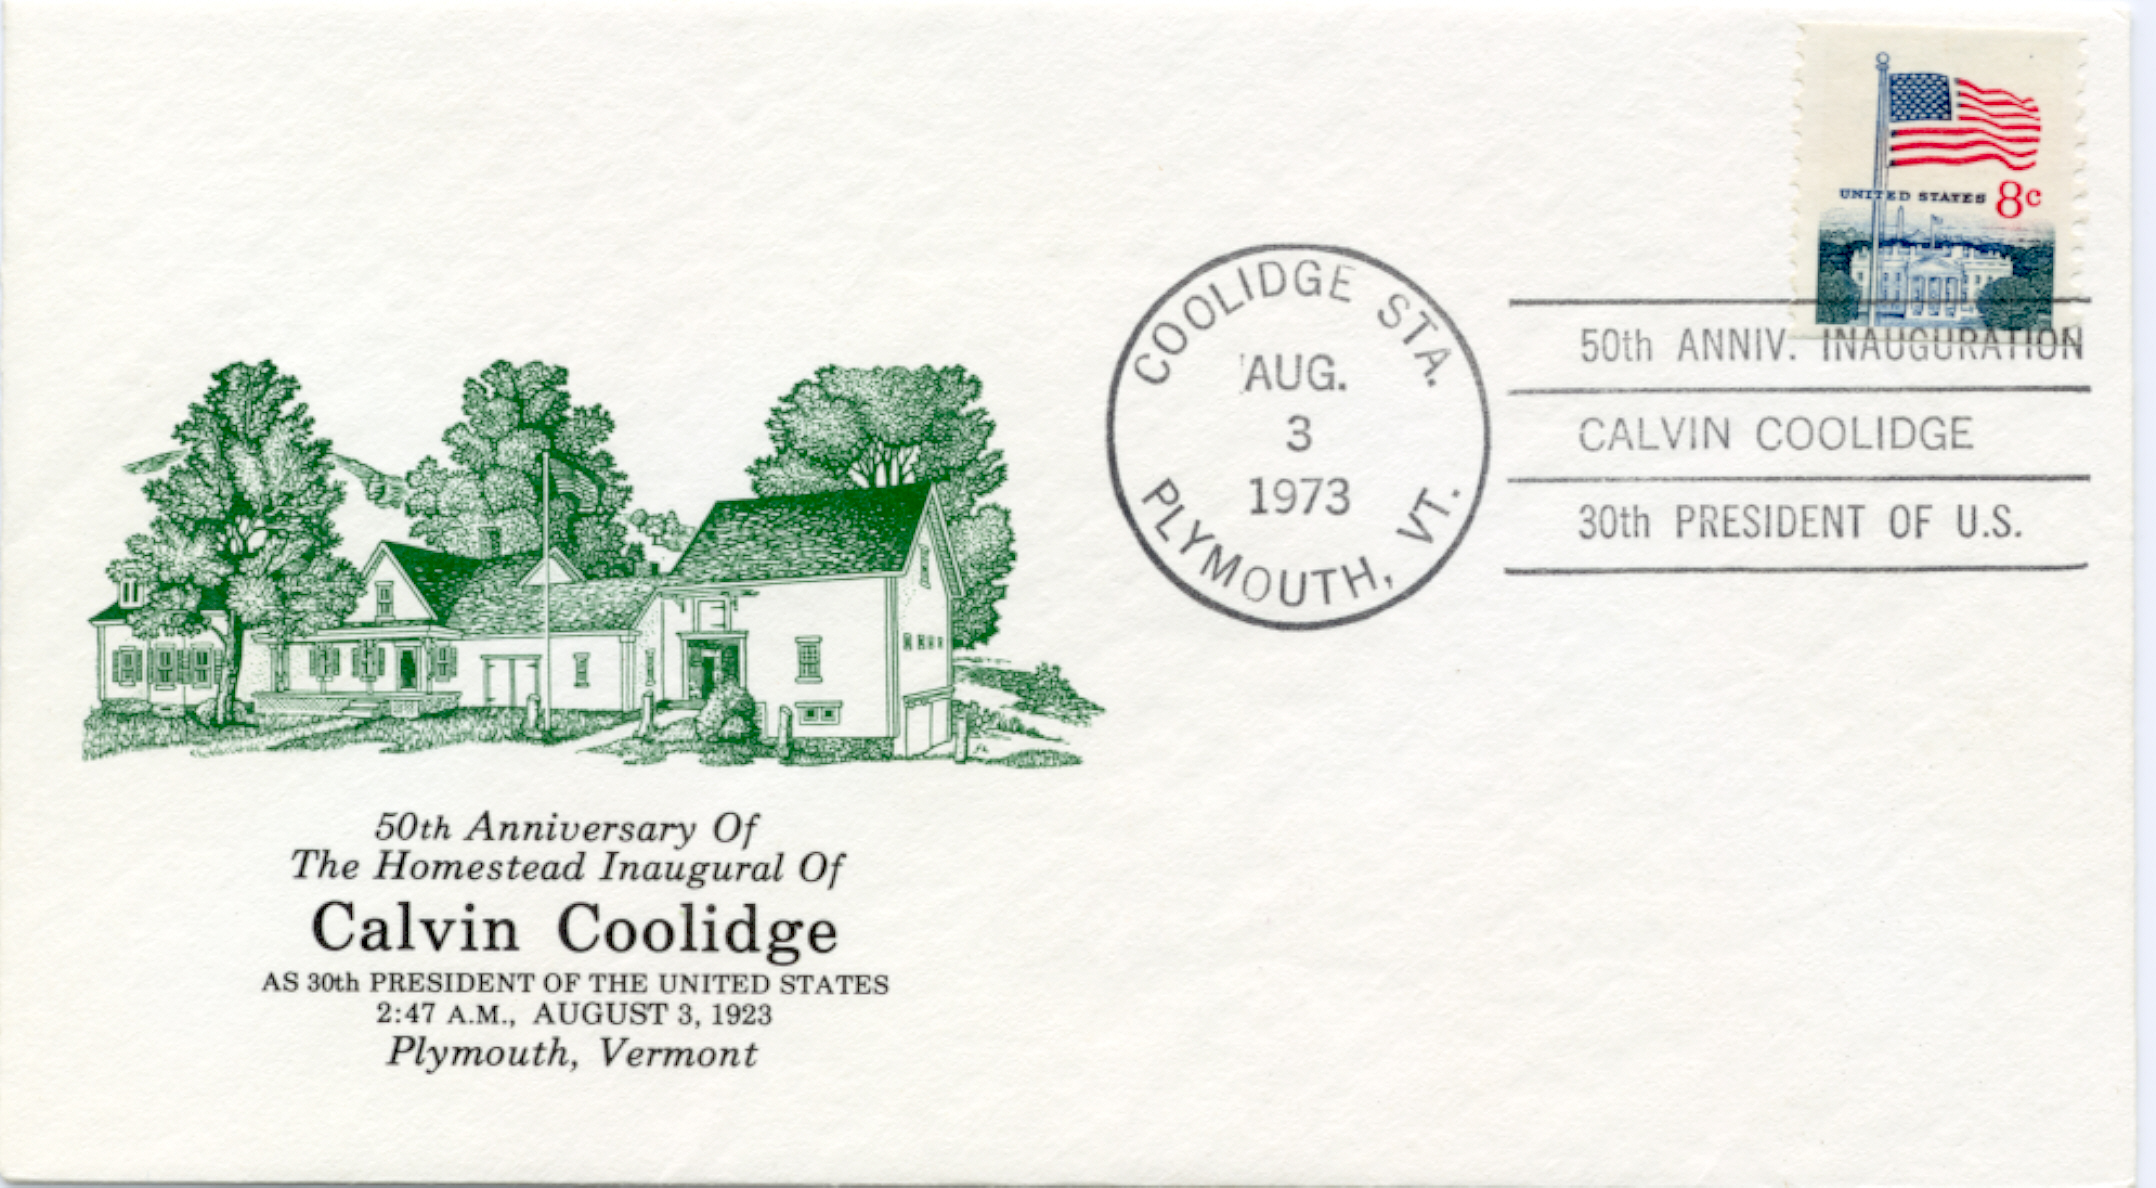 Coolidge Inauguration 50th Anniver 73-08-03